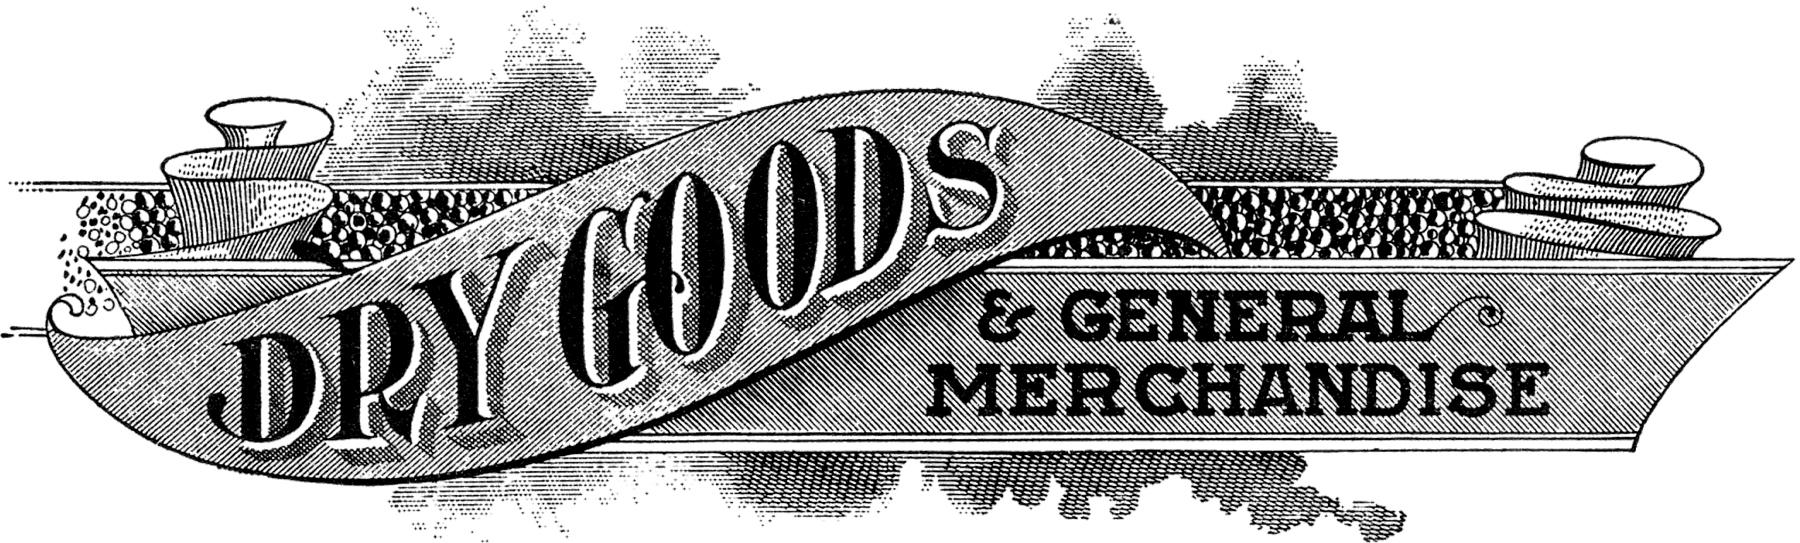 Antique shop sign clipart clip royalty free stock Free Antique Sign Cliparts, Download Free Clip Art, Free Clip Art on ... clip royalty free stock